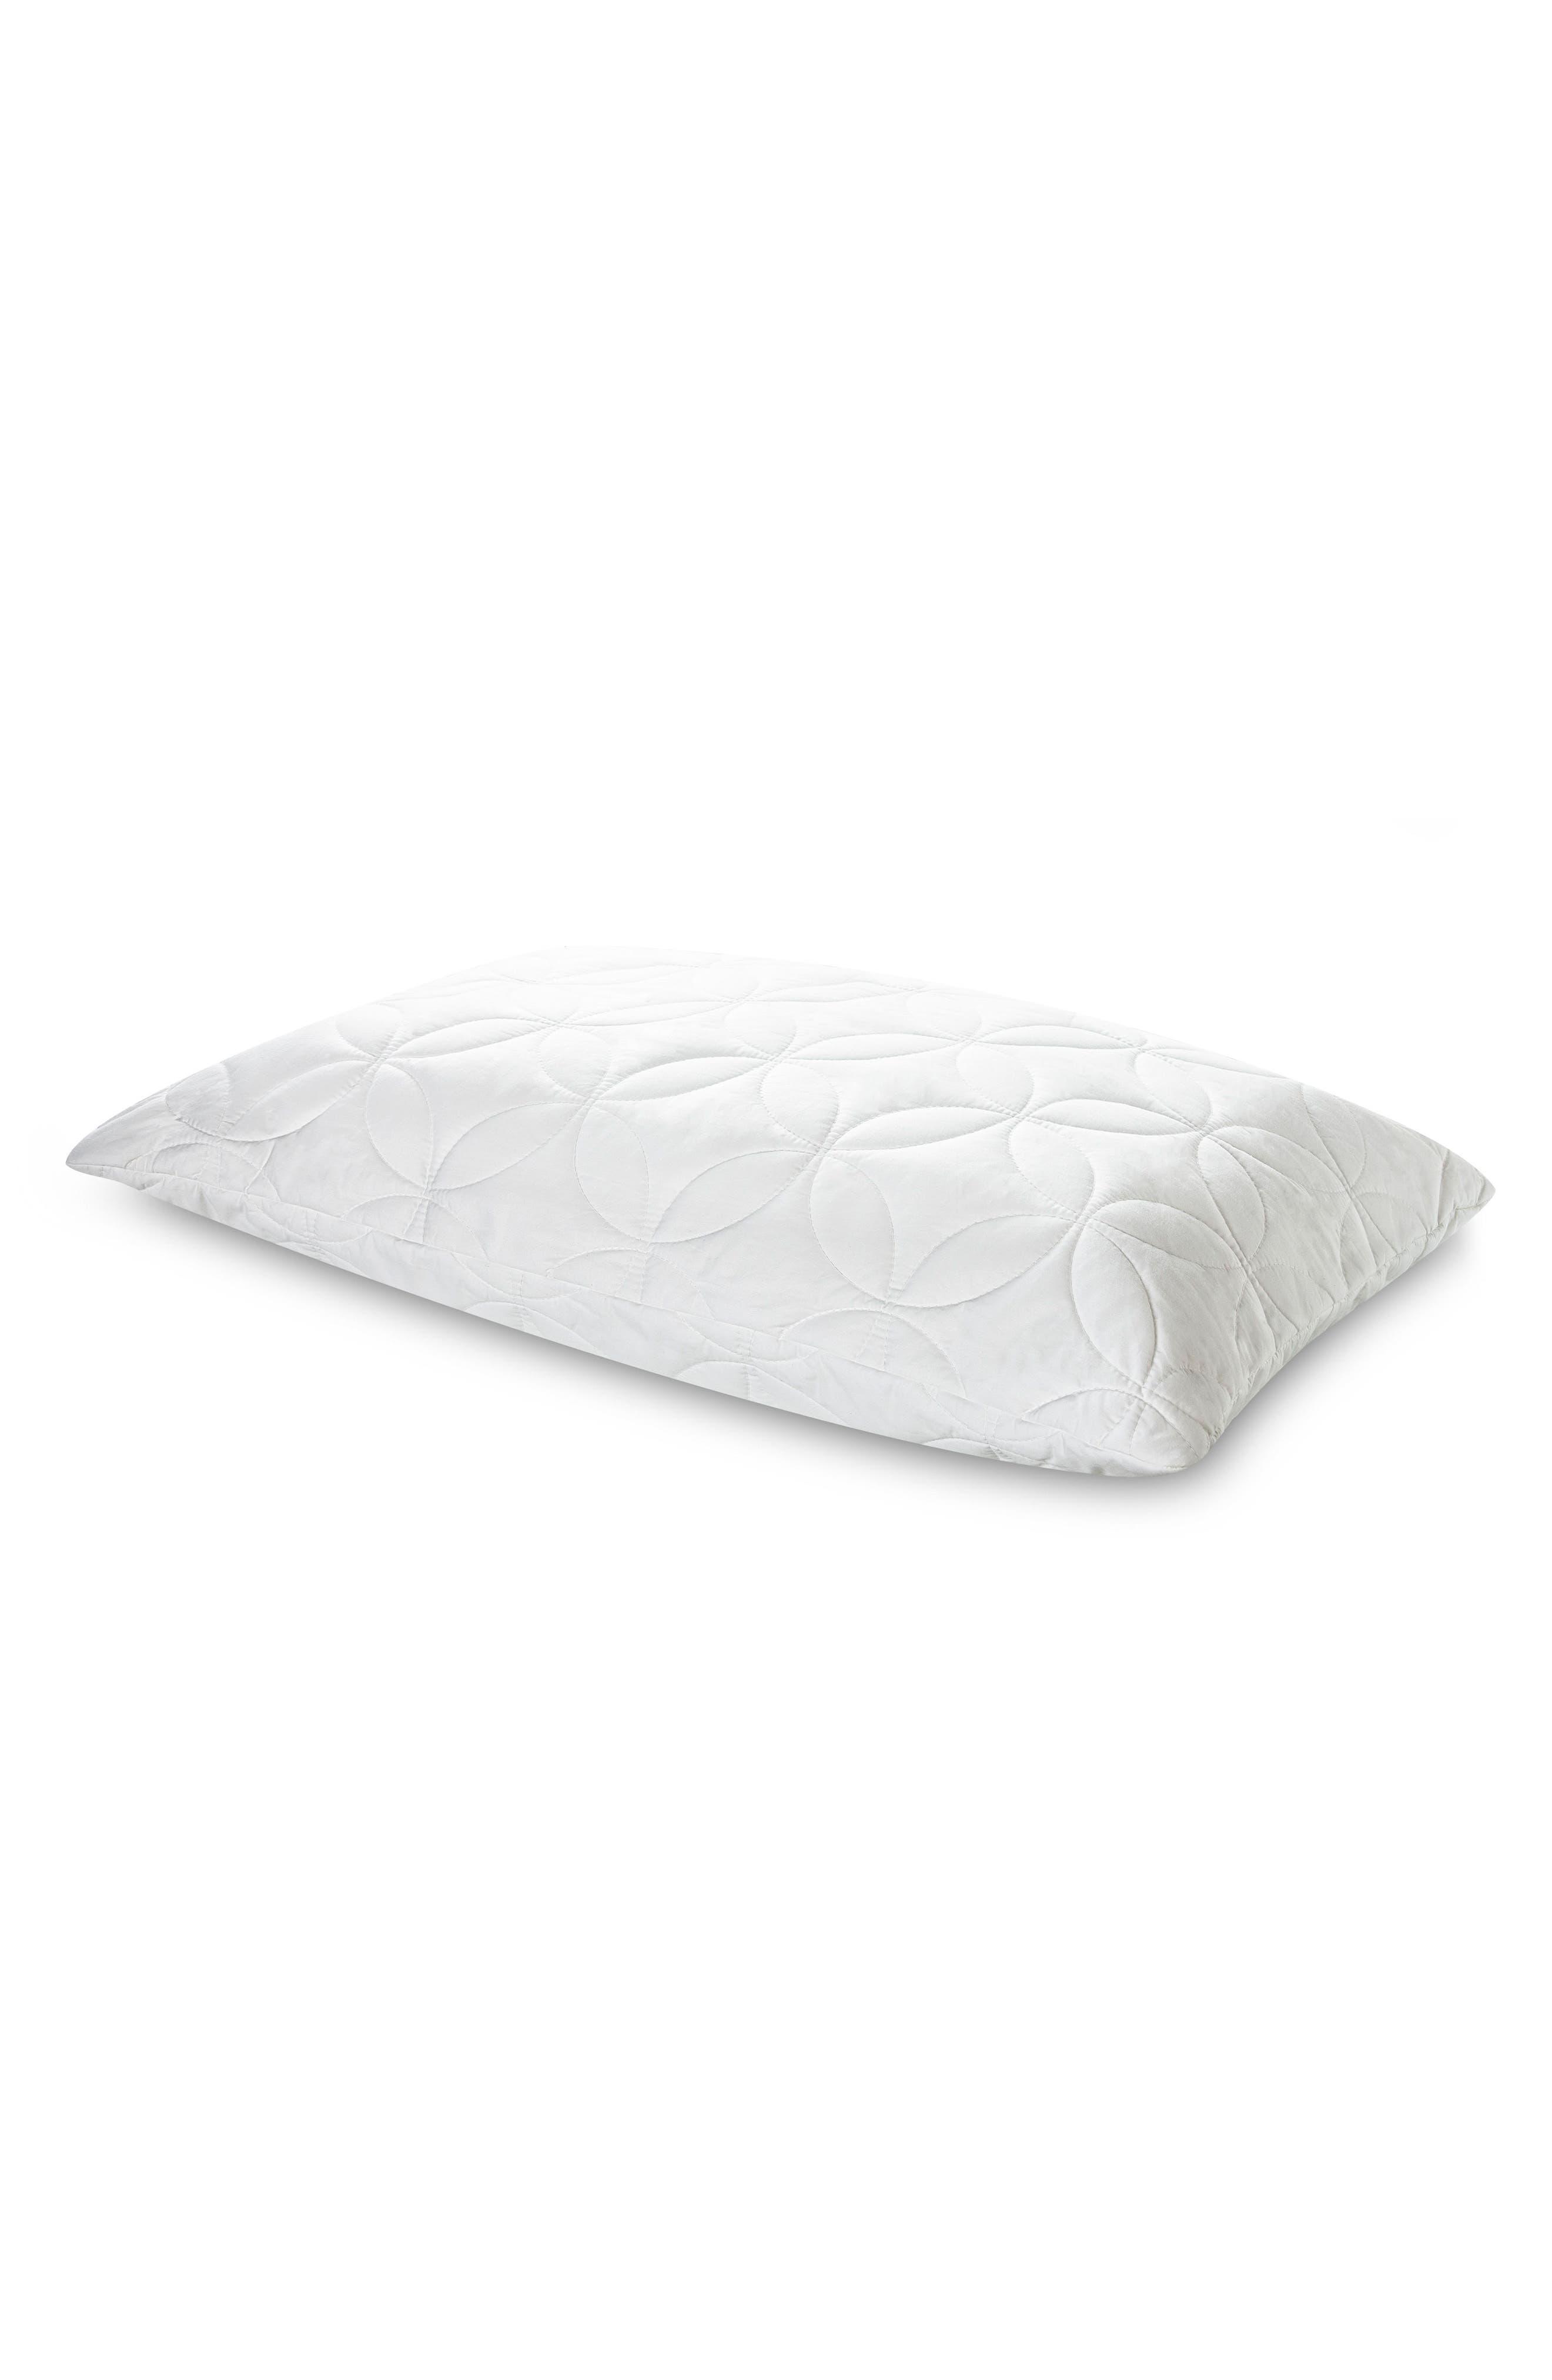 TEMPUR-Cloud Soft & Conforming Queen Pillow,                         Main,                         color, White